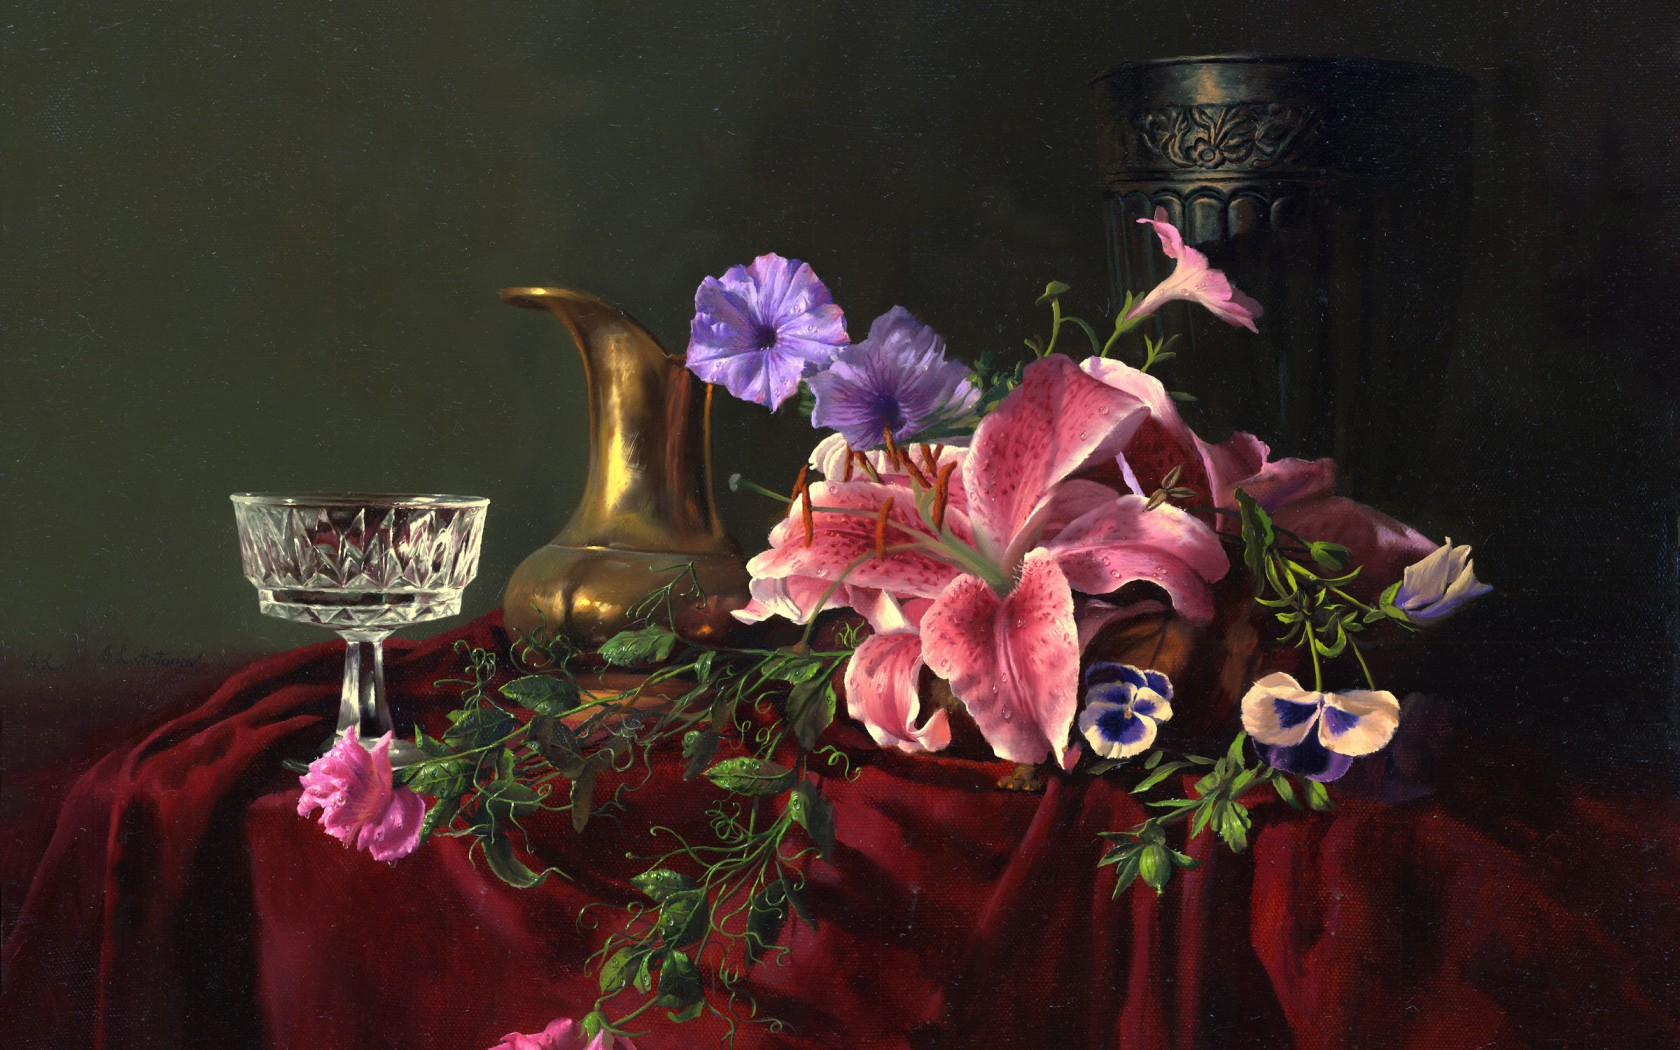 Painting still life Alexei Antonov flowers jar glass crystal vase lilies wall